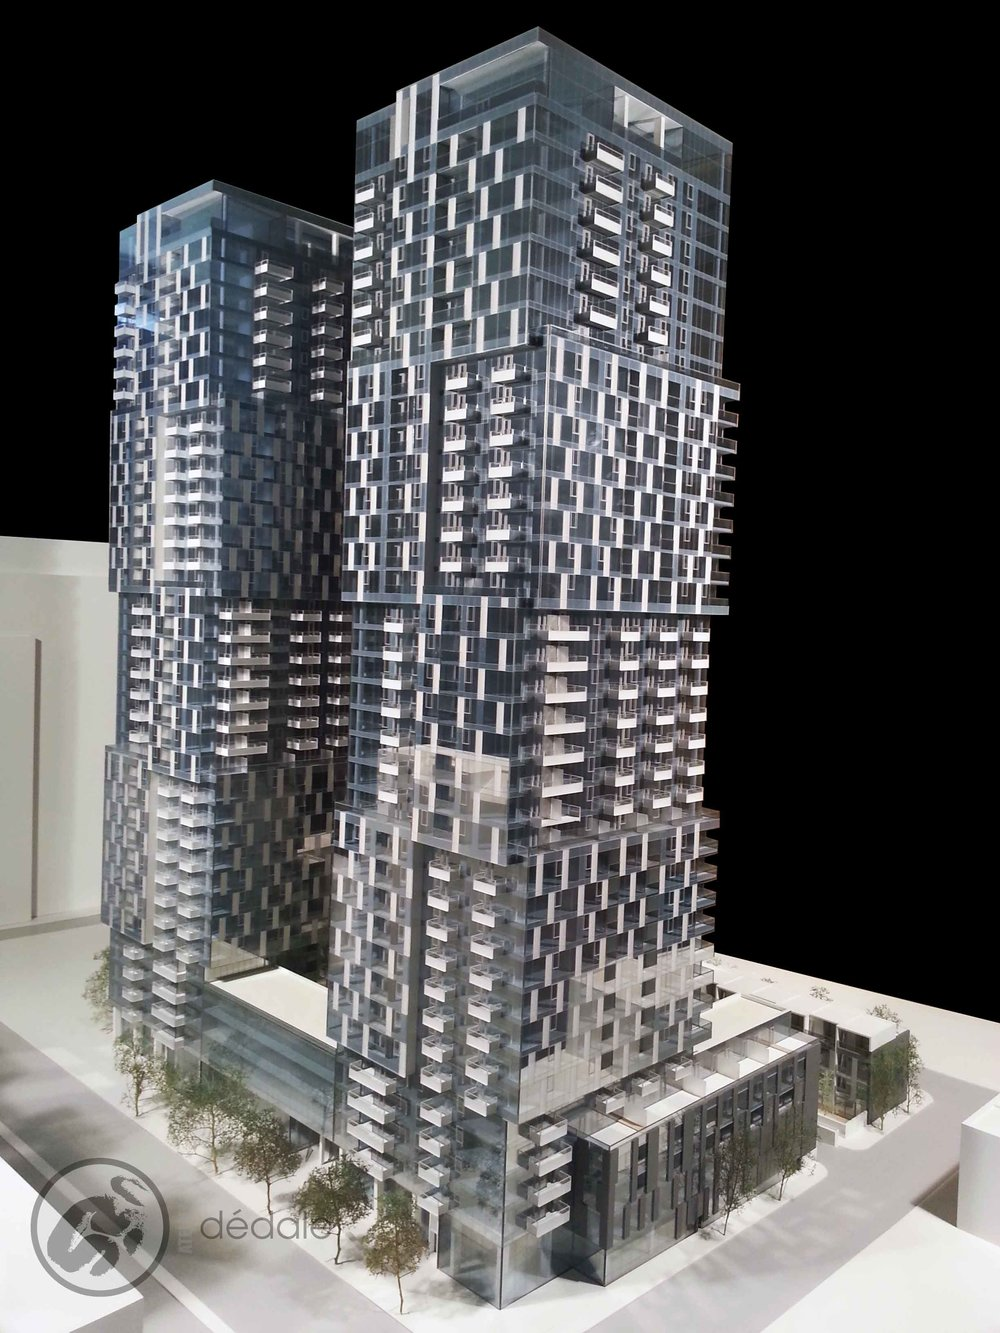 Ptojet YUL maquette architecturale